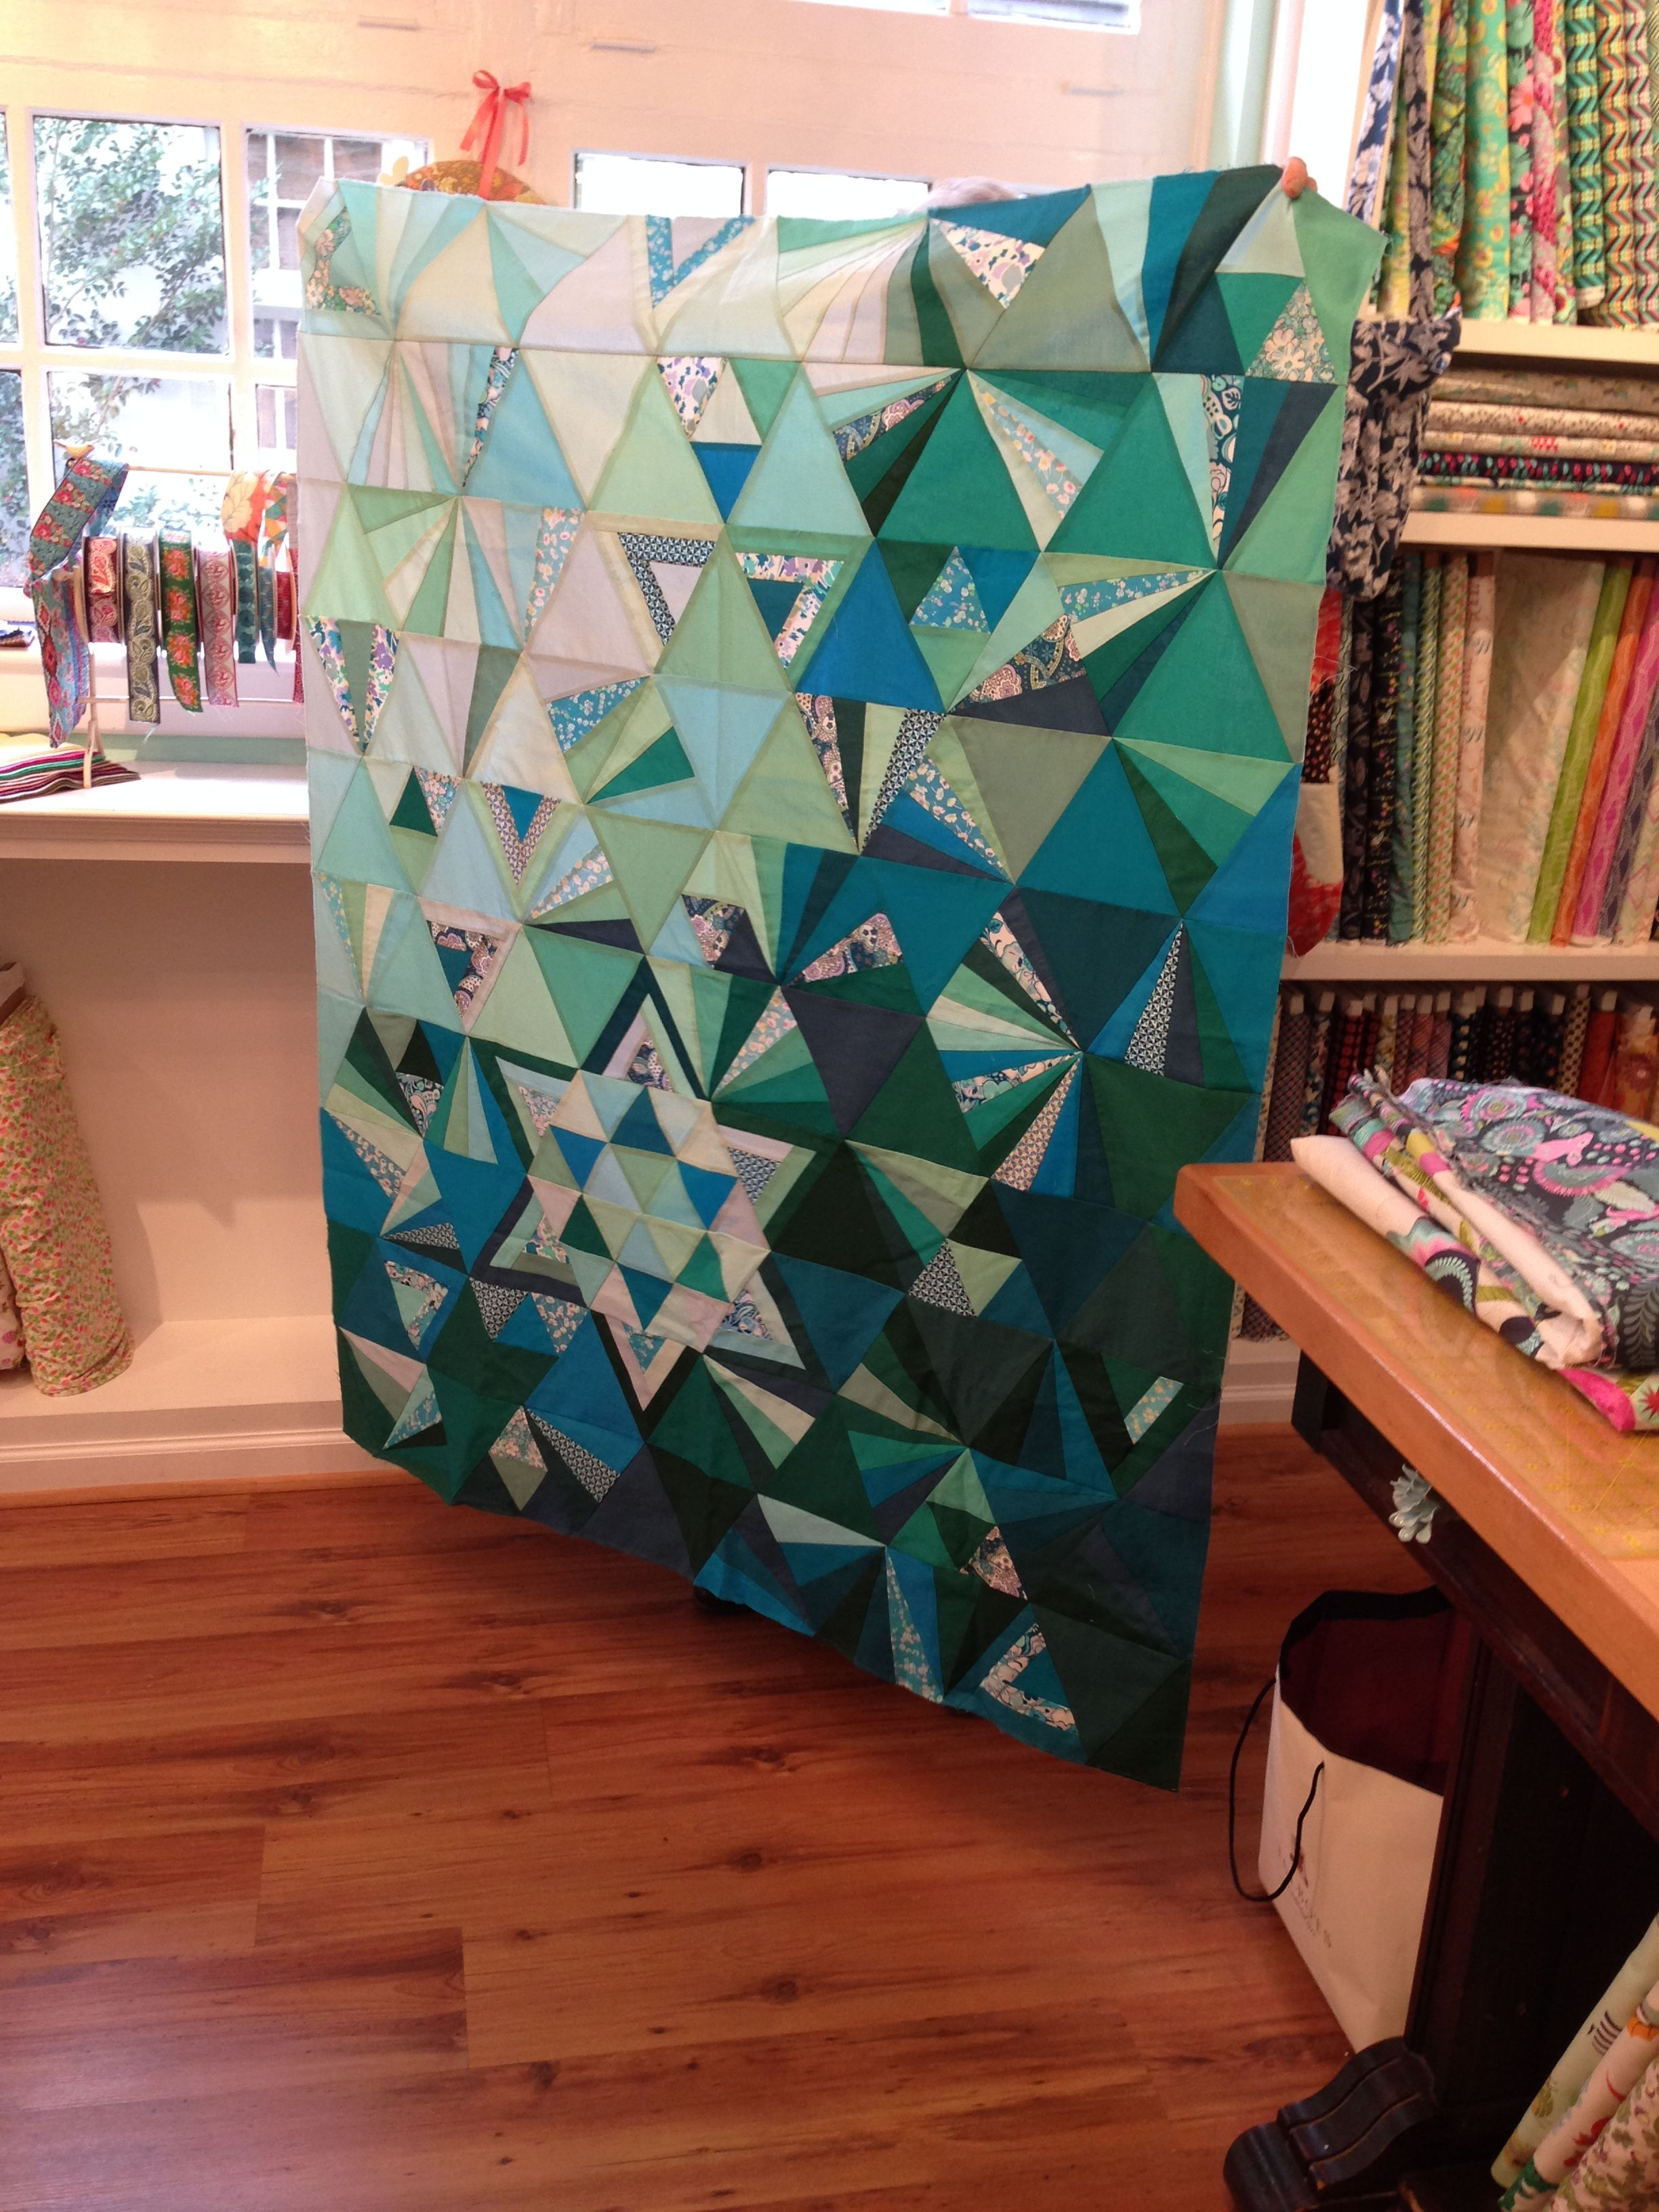 tessellation quilt pattern alison glass - Google Search | quilt ... : tessellation quilt - Adamdwight.com